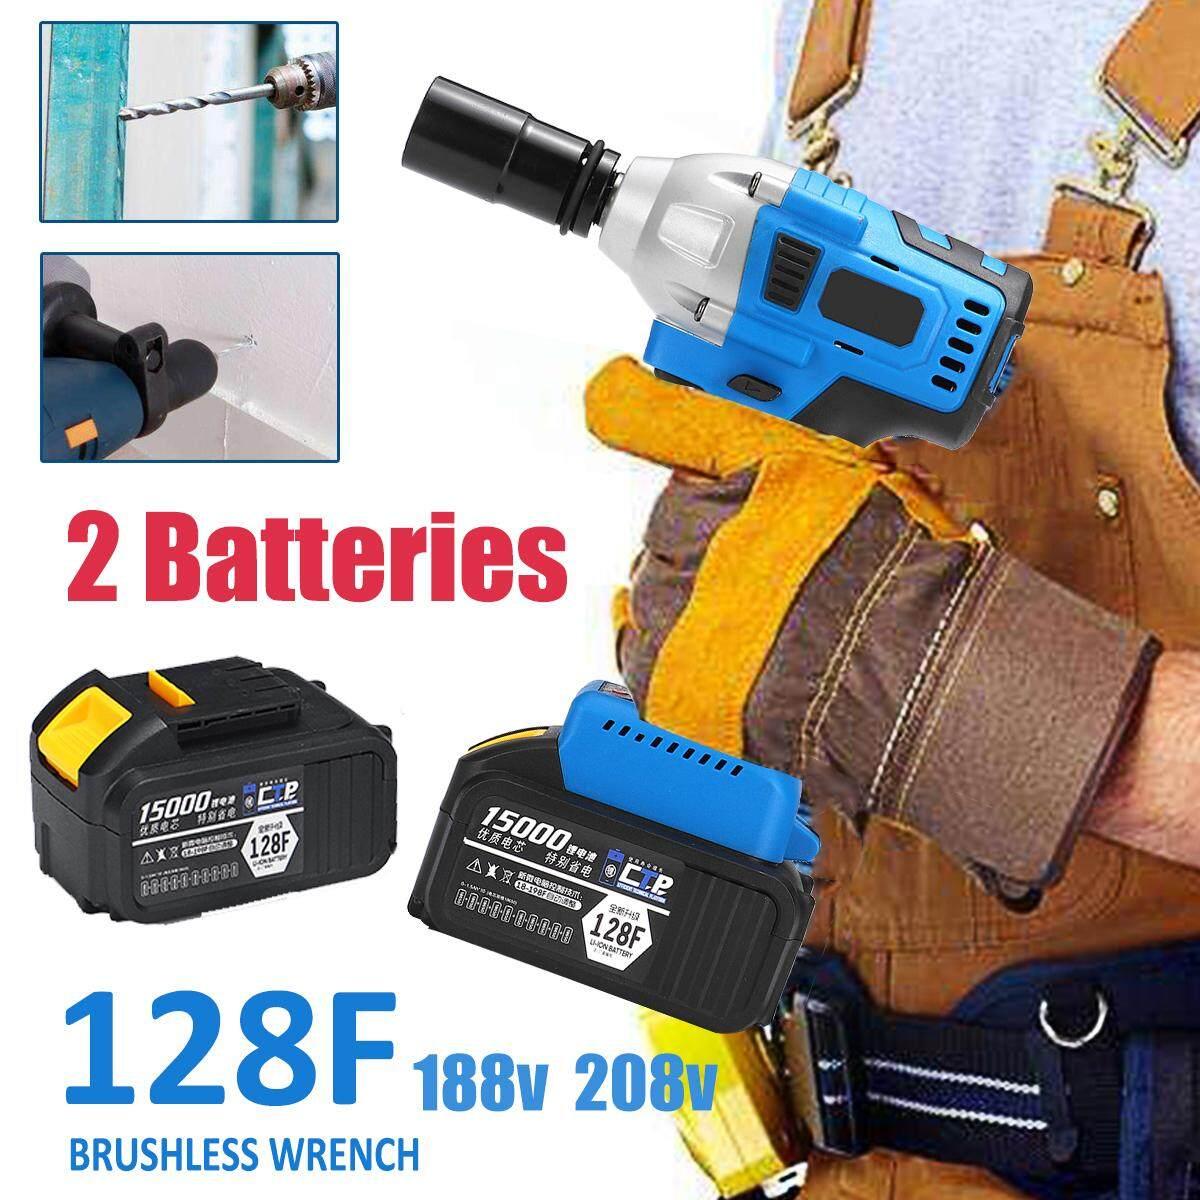 B128F Brushless Cordless Impact Wrench 1/2 Socket Tool With 15000mAh